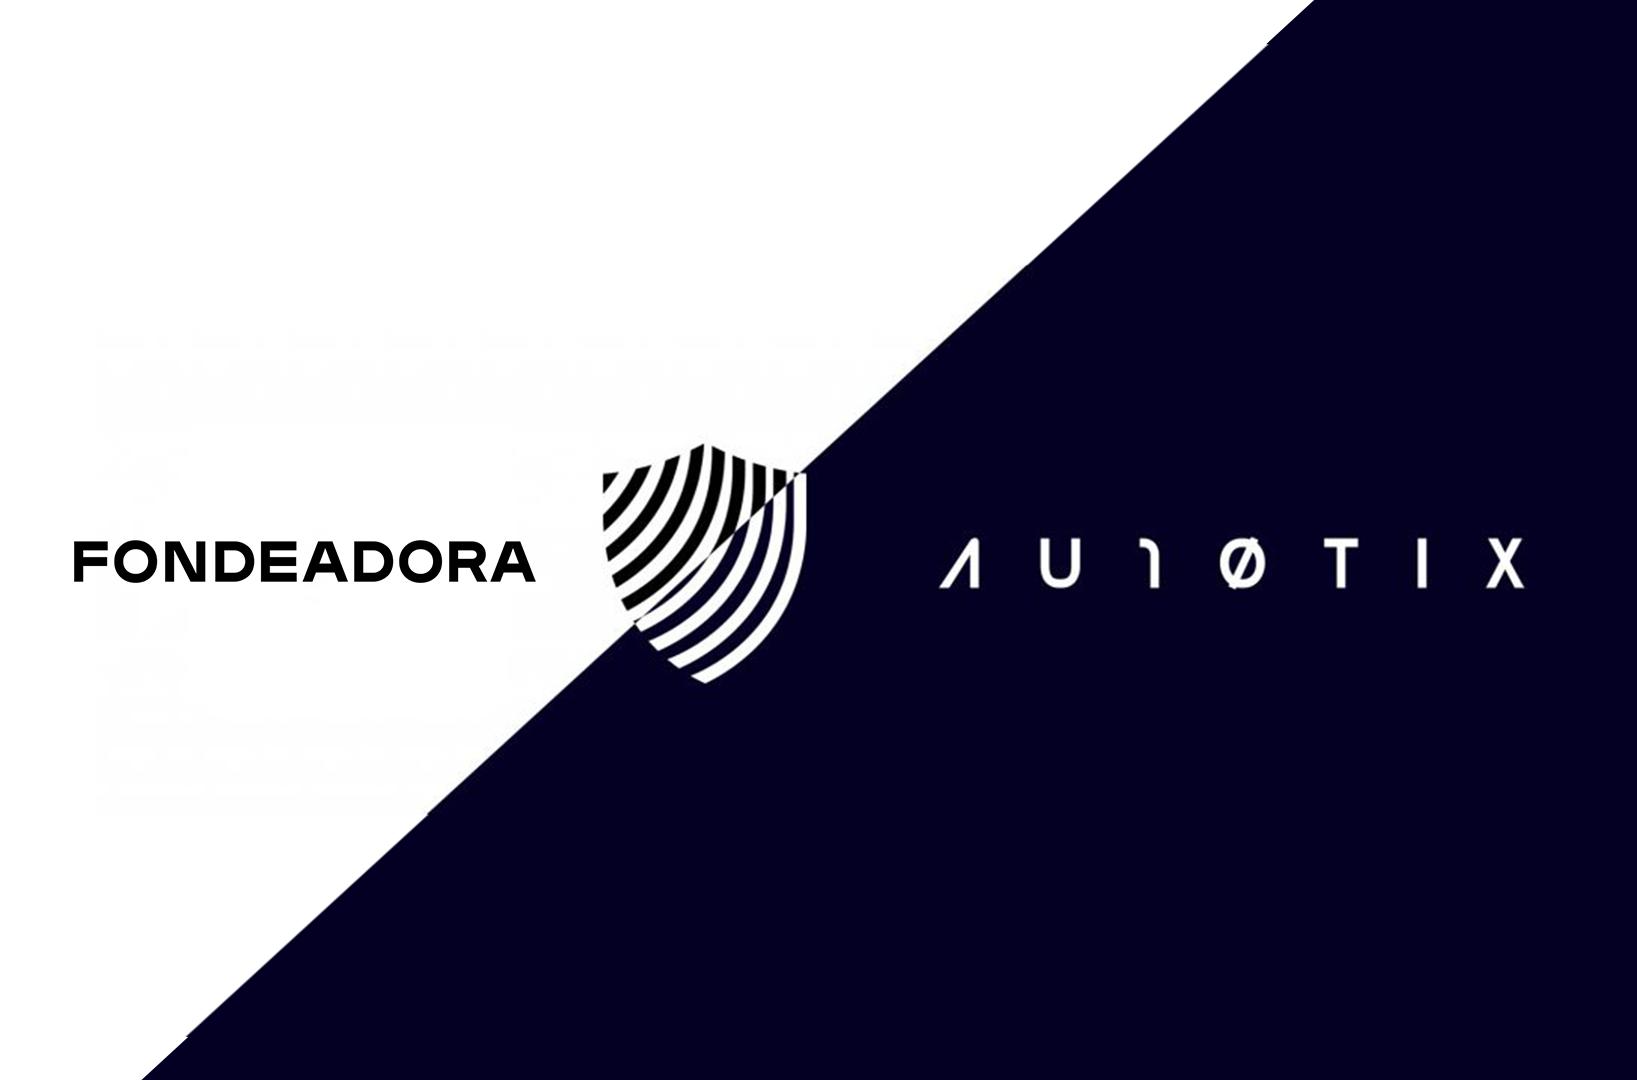 FONDEADORA SELECTS AU10TIX FOR  AUTOMATED IDENTITY VERIFICATION SERVICES